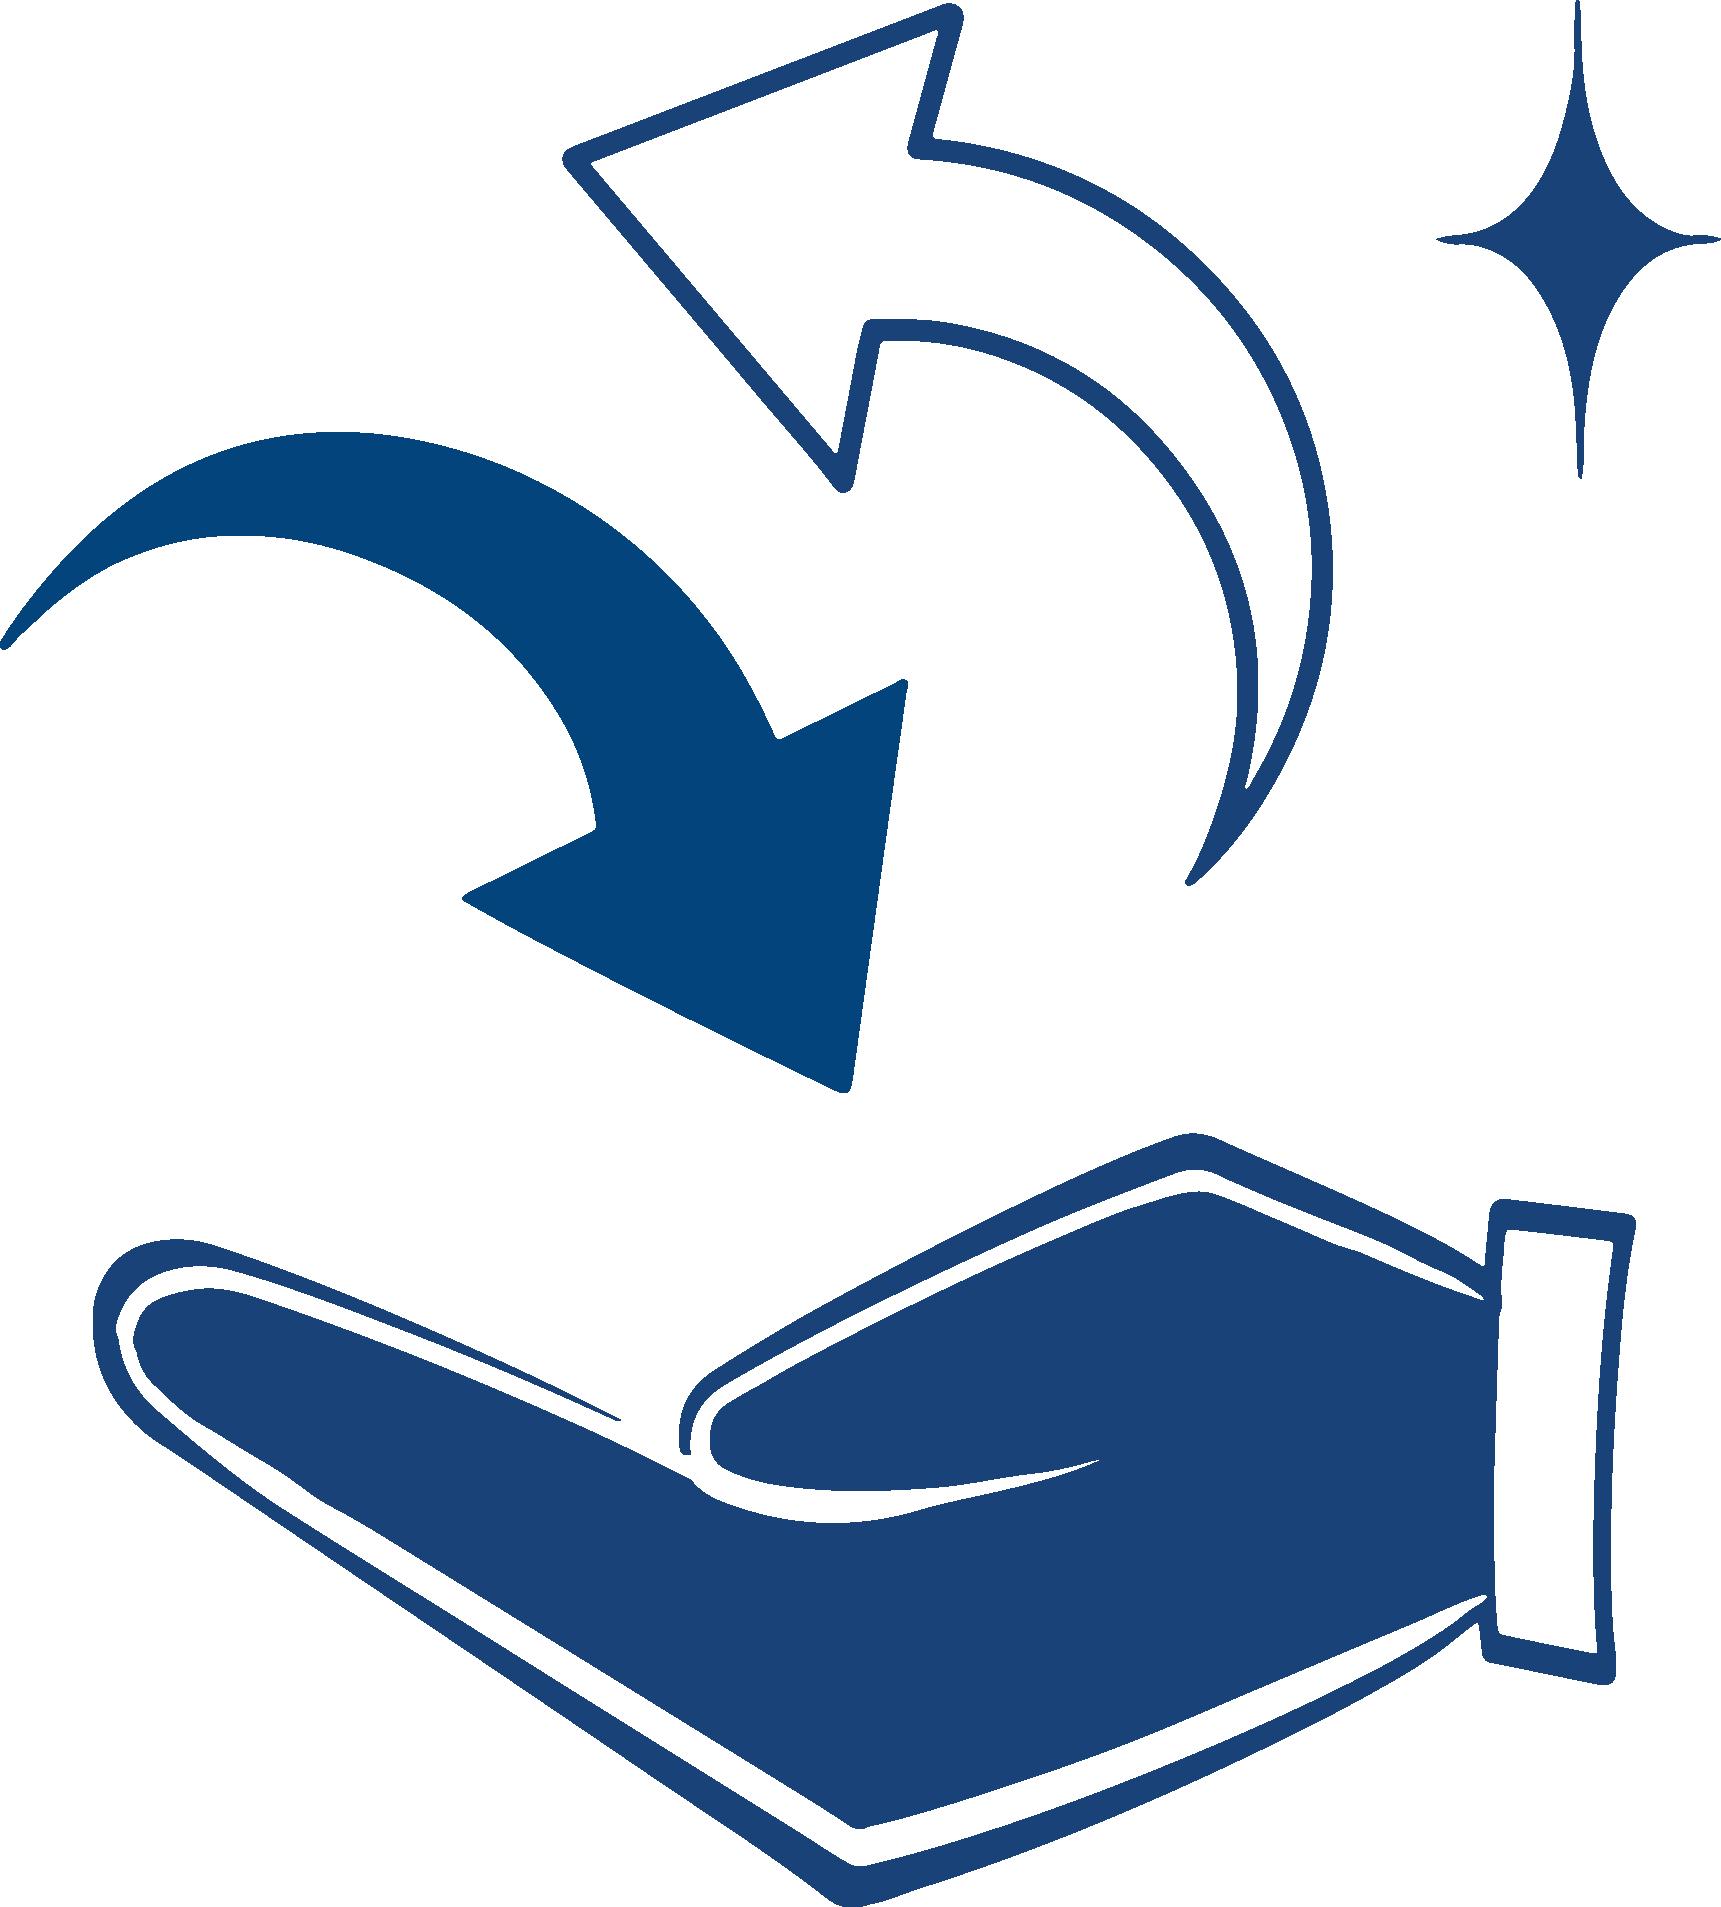 Purpose of service enhancement icon